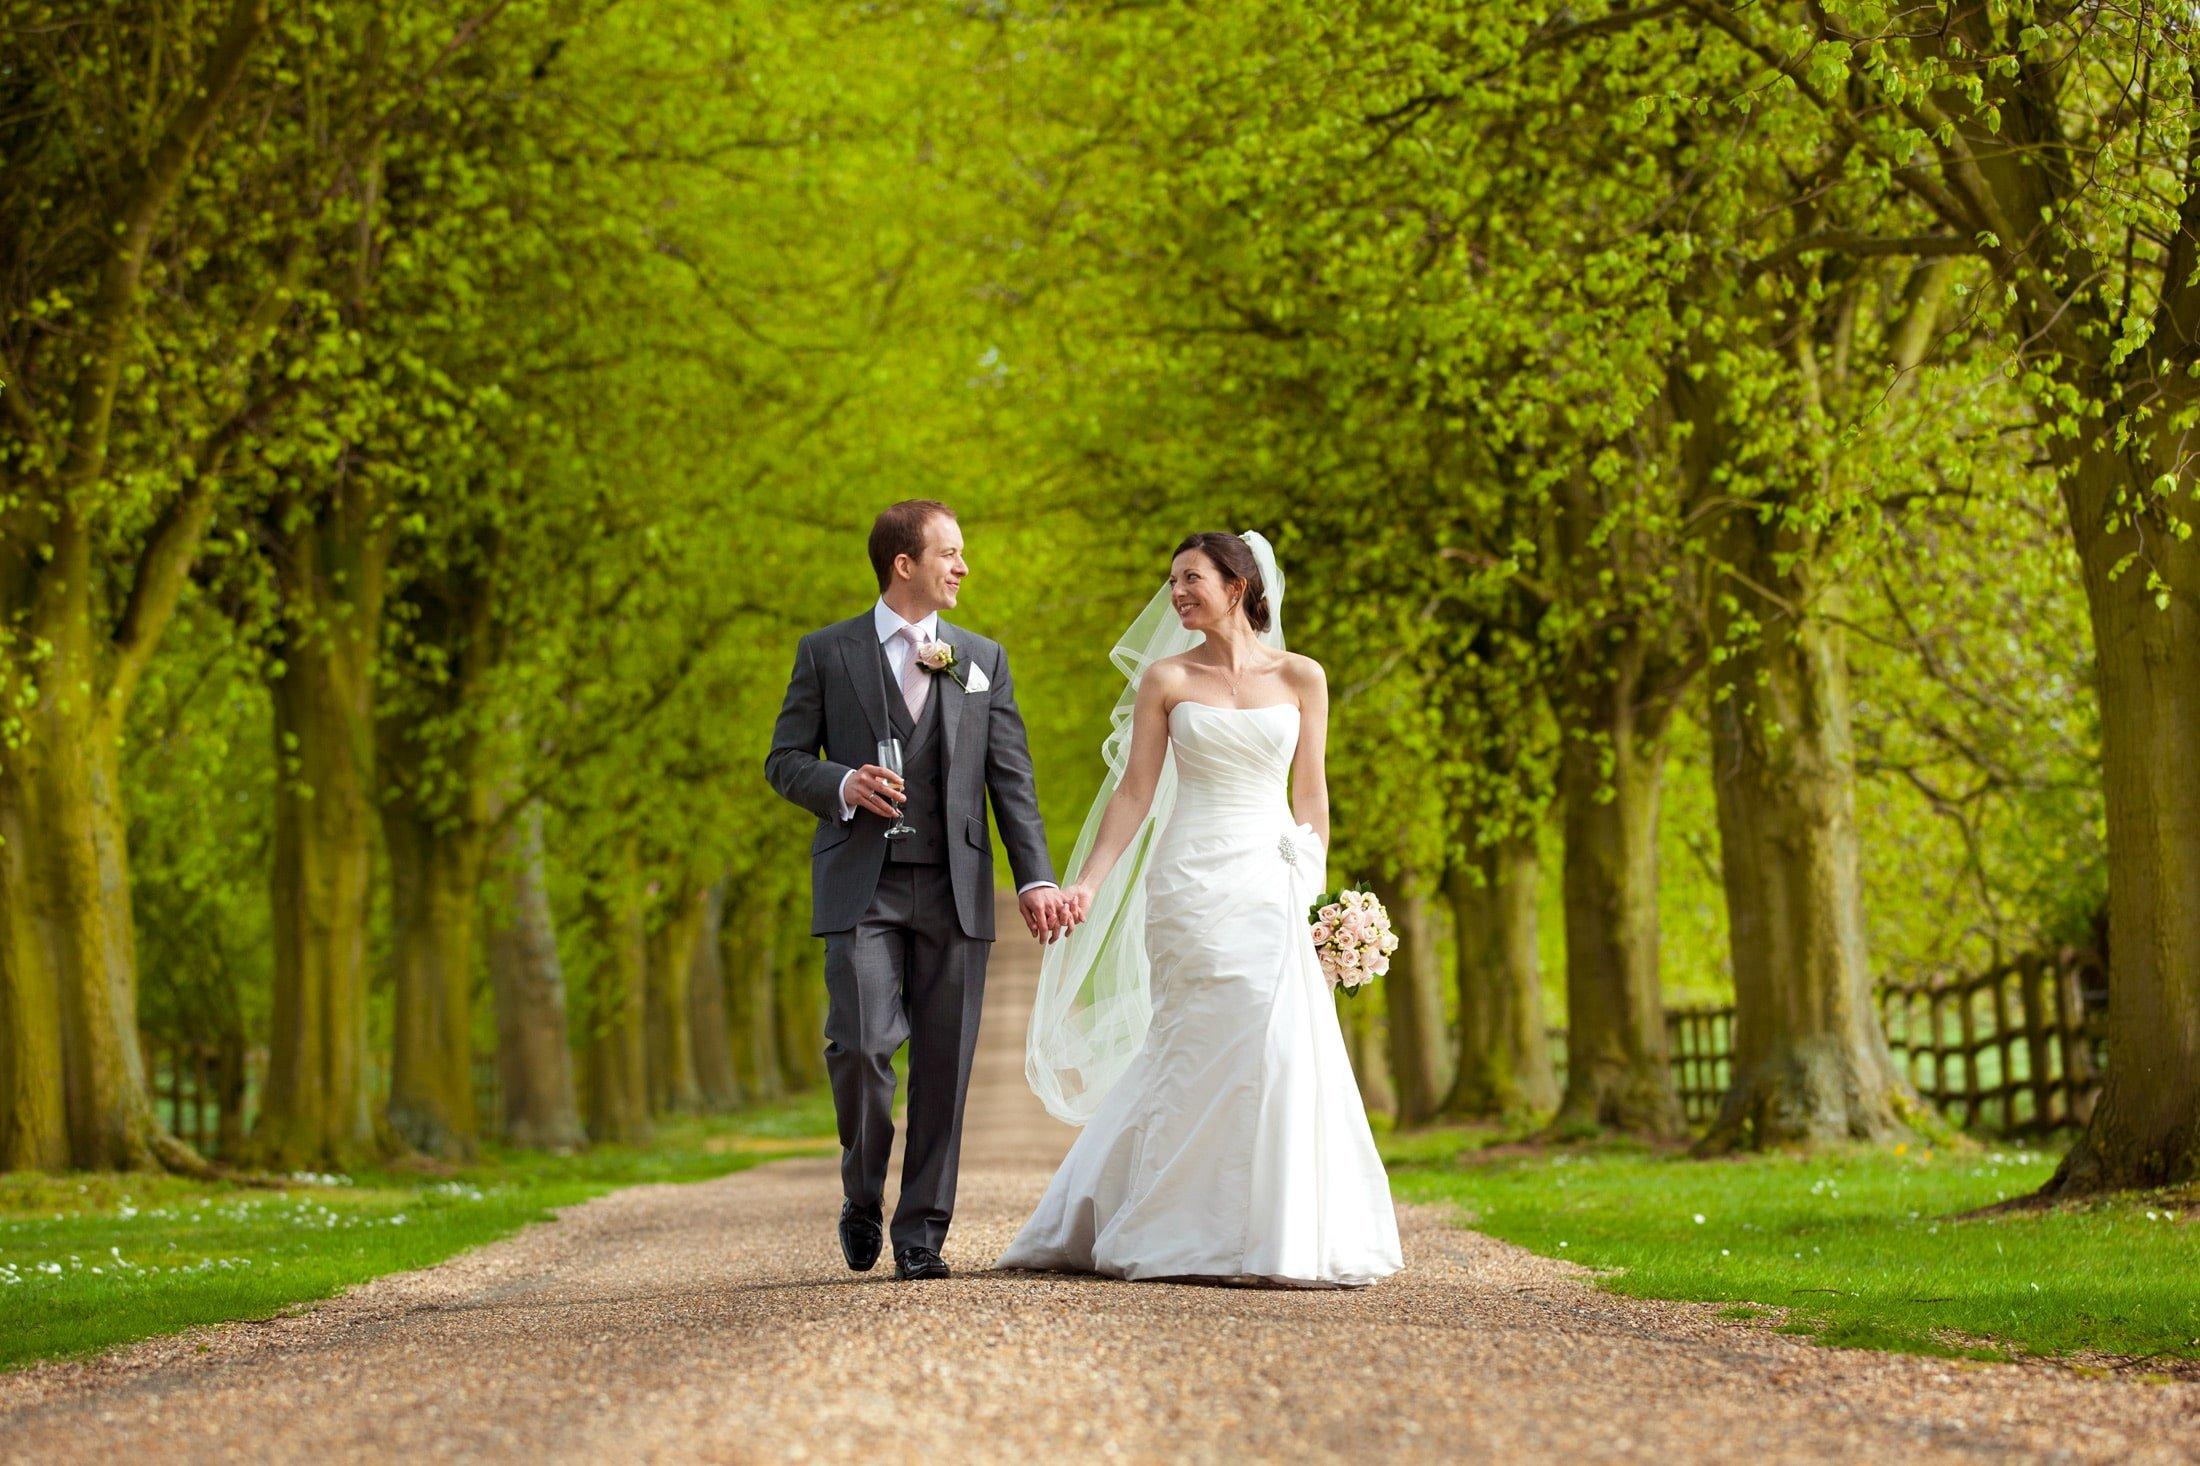 Notley Abbey wedding photographer | Sarah + Anthony